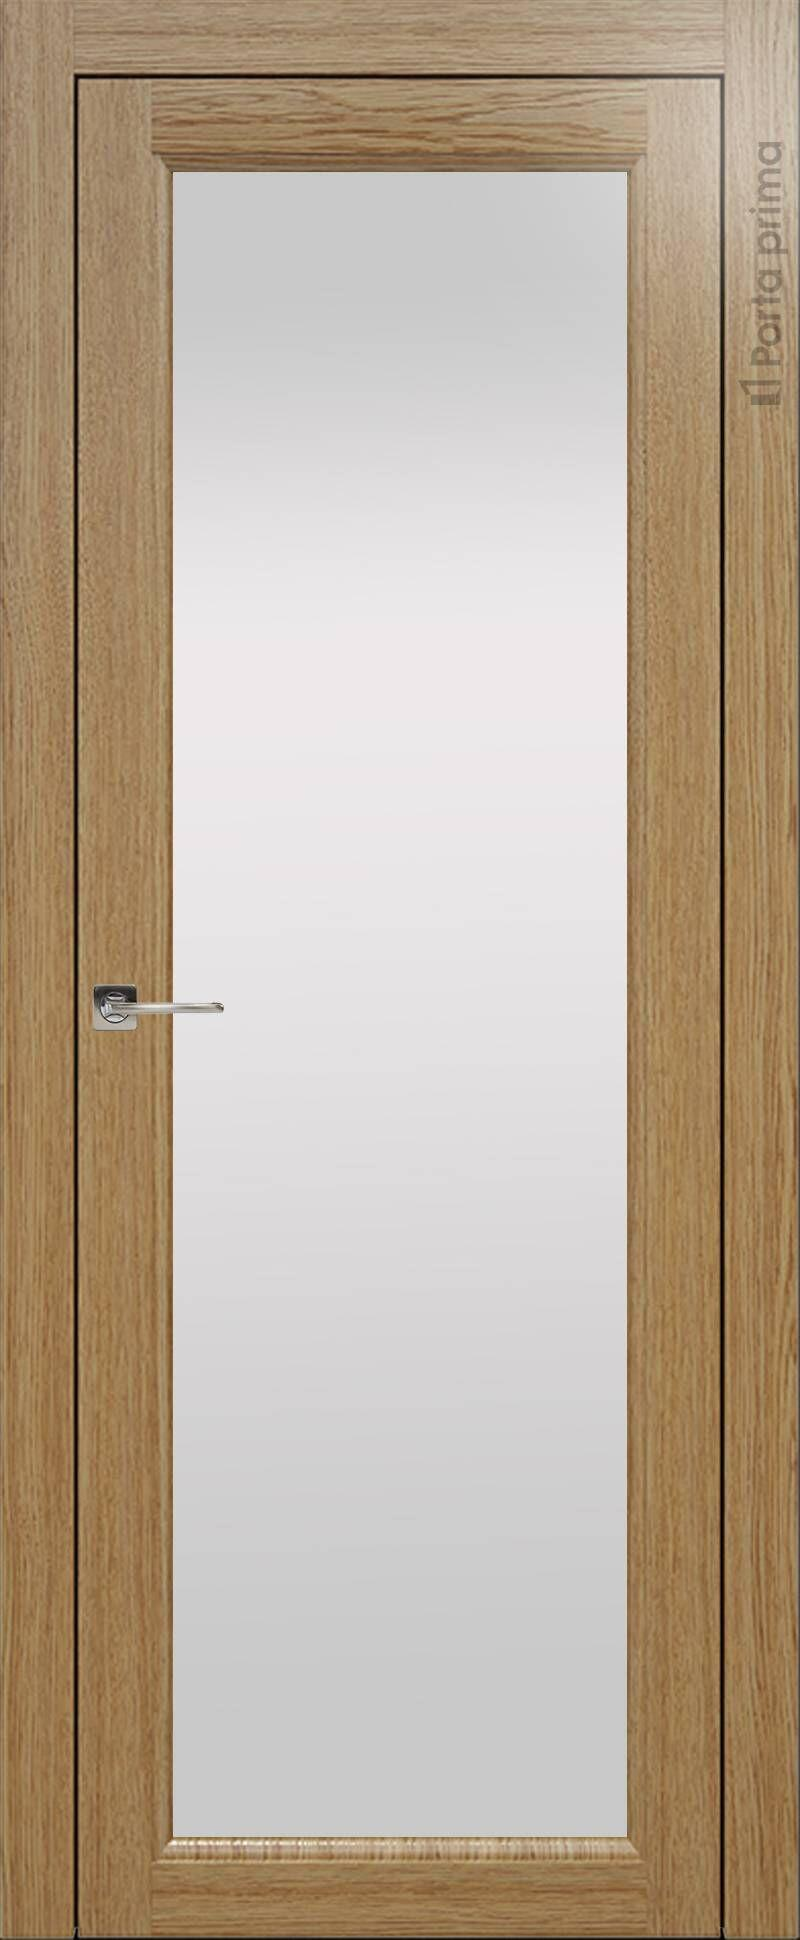 Sorrento-R Б4 цвет - Дуб карамель Со стеклом (ДО)